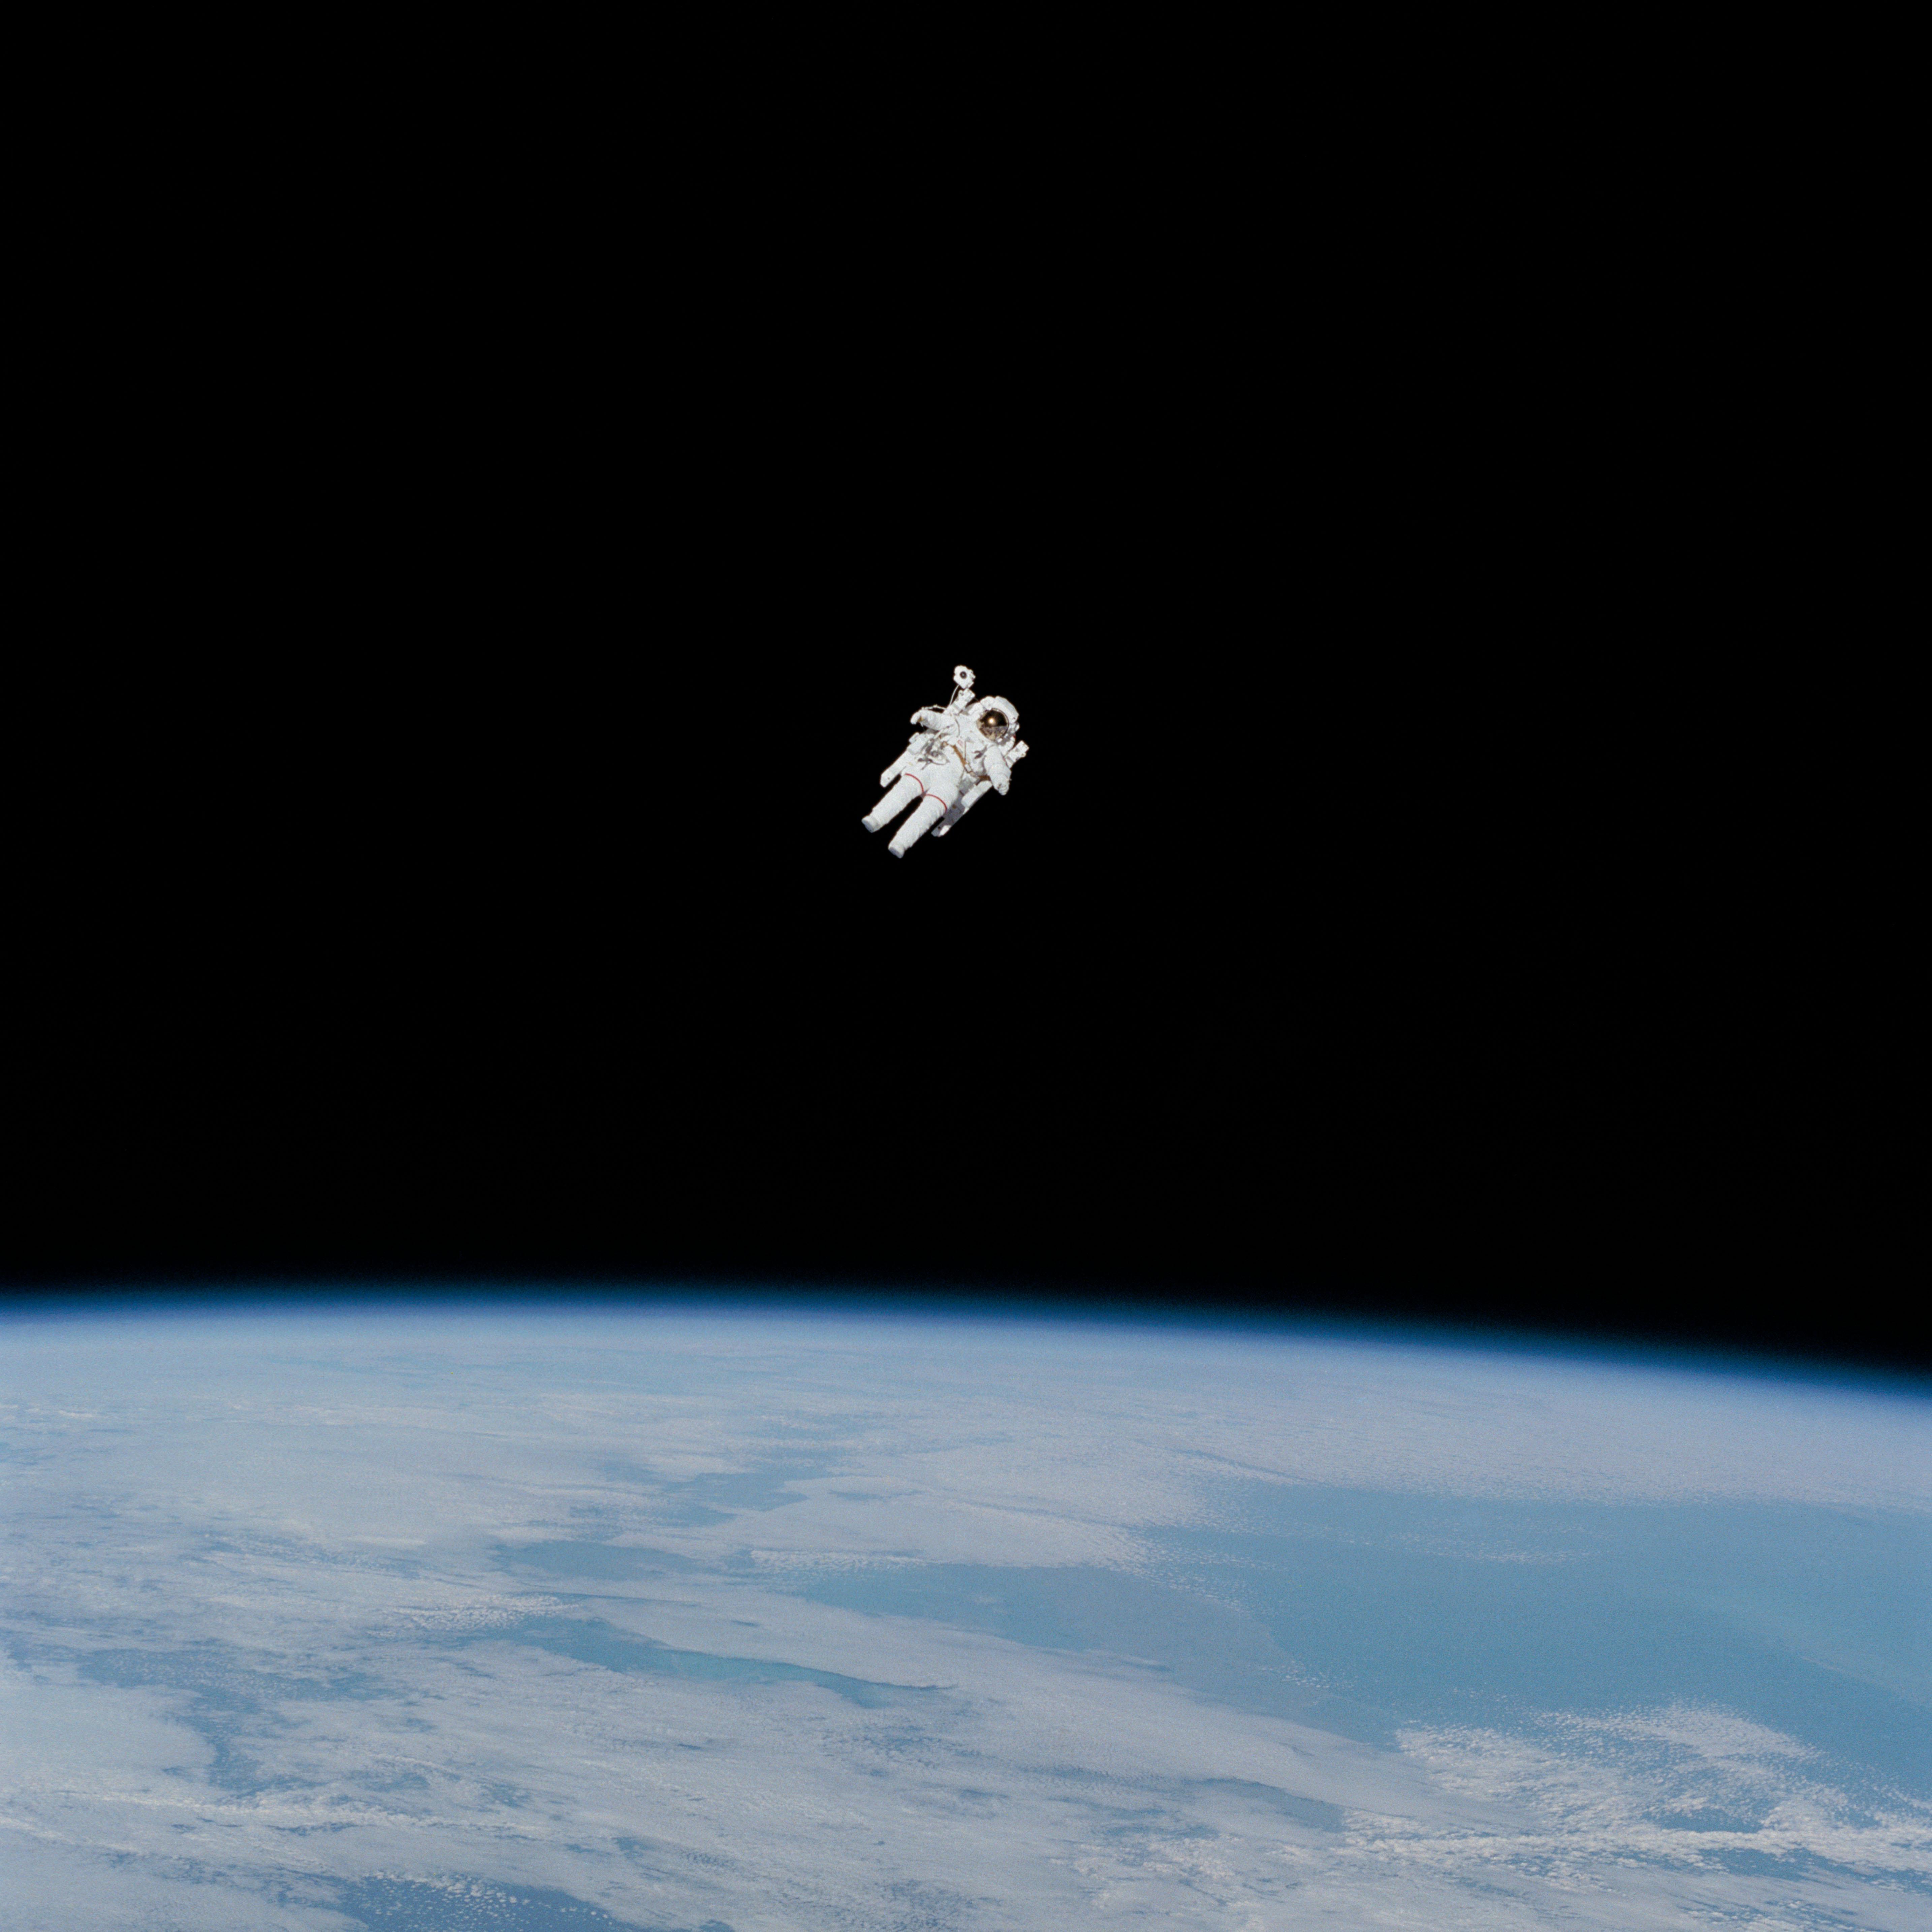 NASA Celebrates 50 Years of Spacewalking | NASA